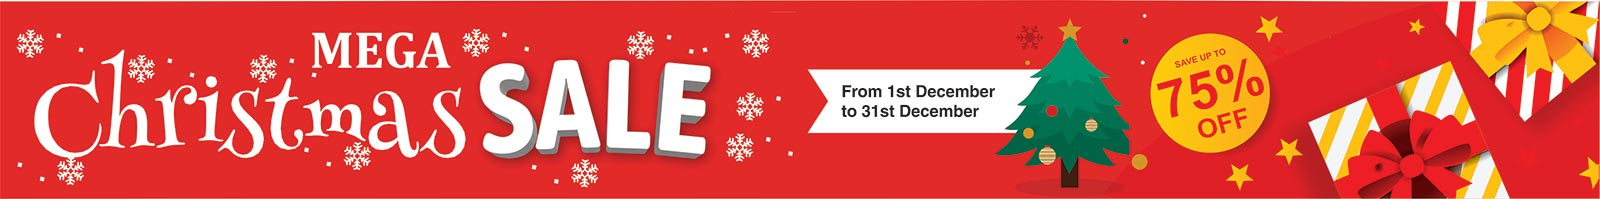 Engine Trust Christmas Offer